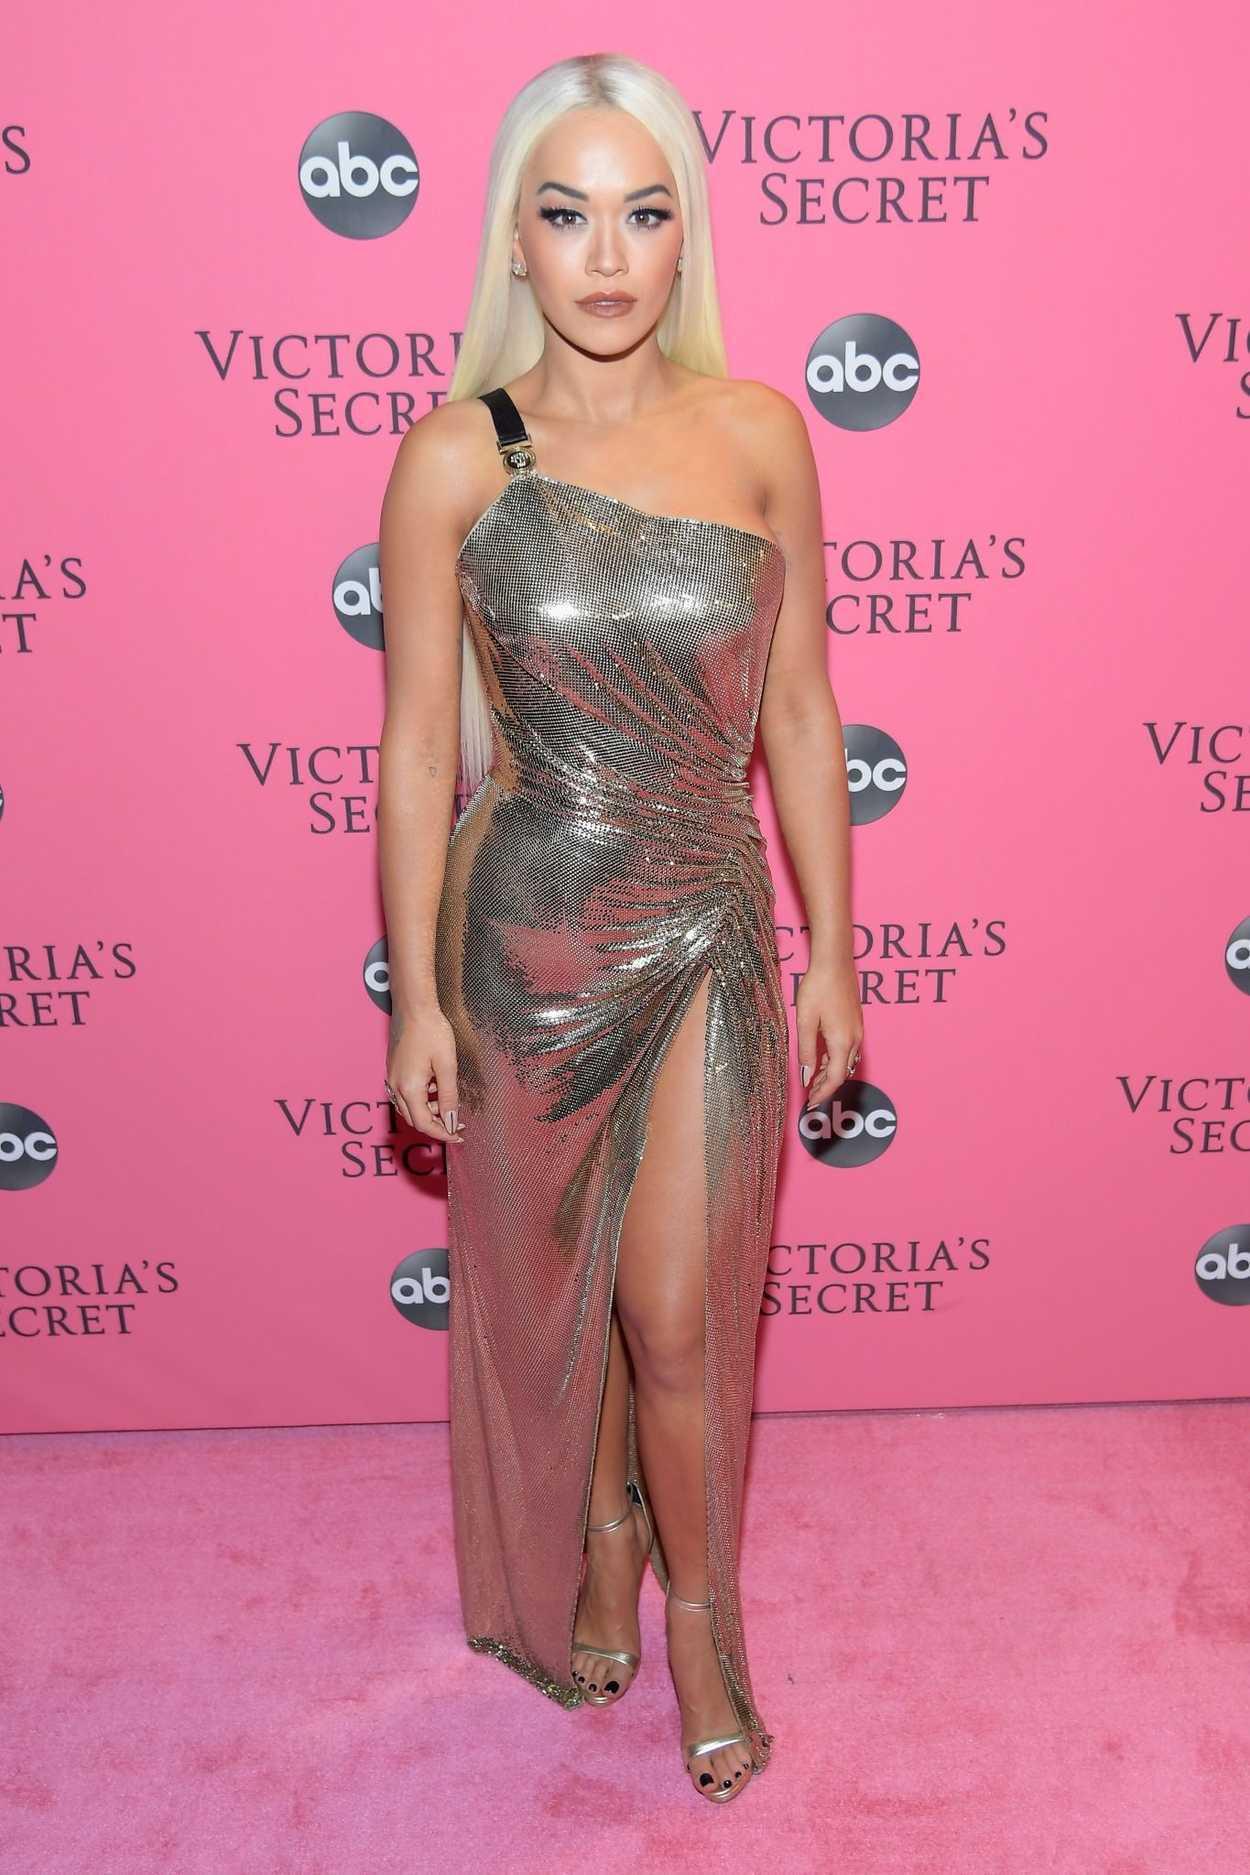 Where Is This Year Victoria Secret Fashion Show